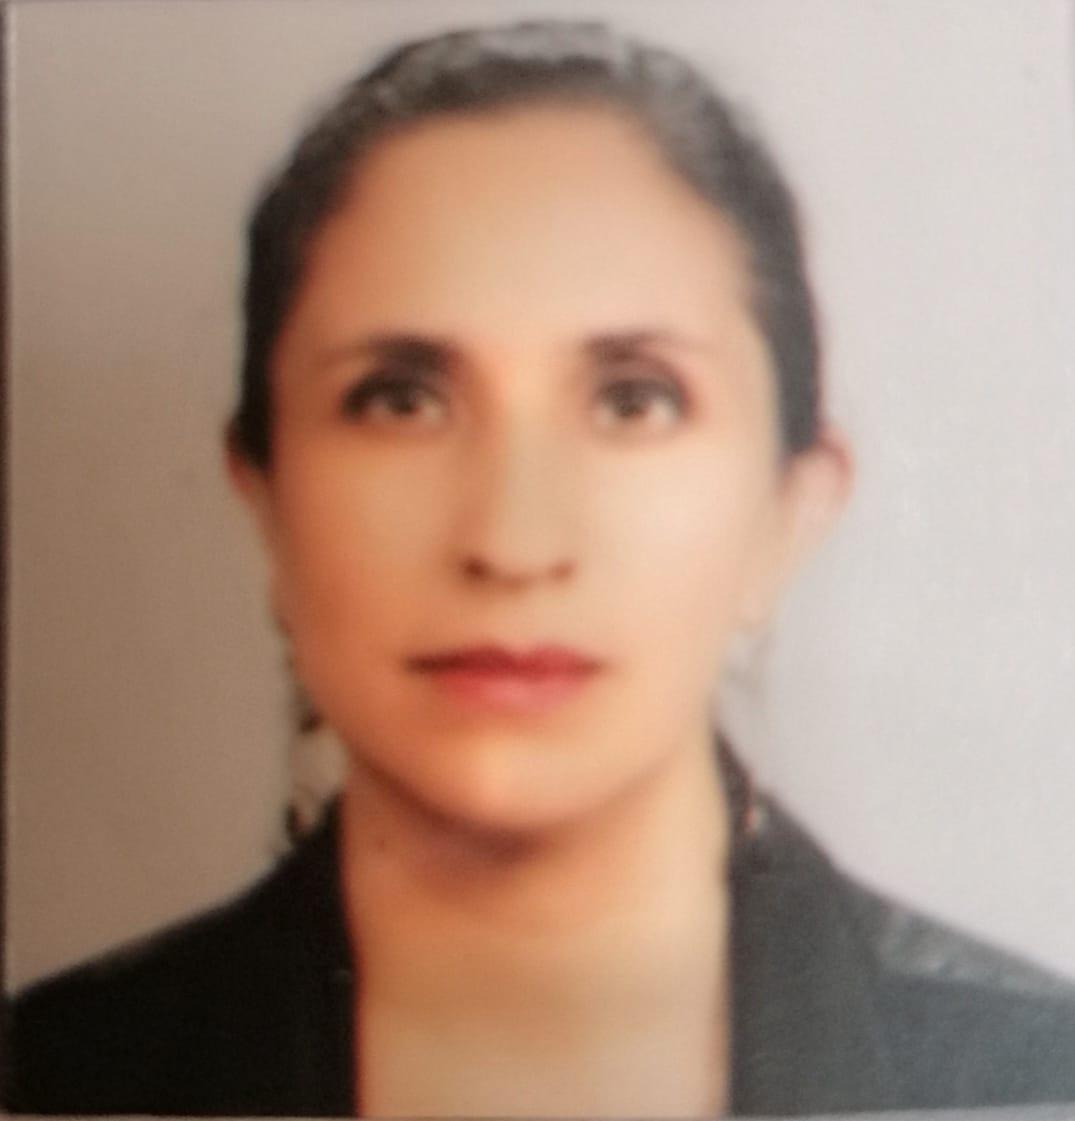 Dra. Ivone del Rosario Martínez Benítez